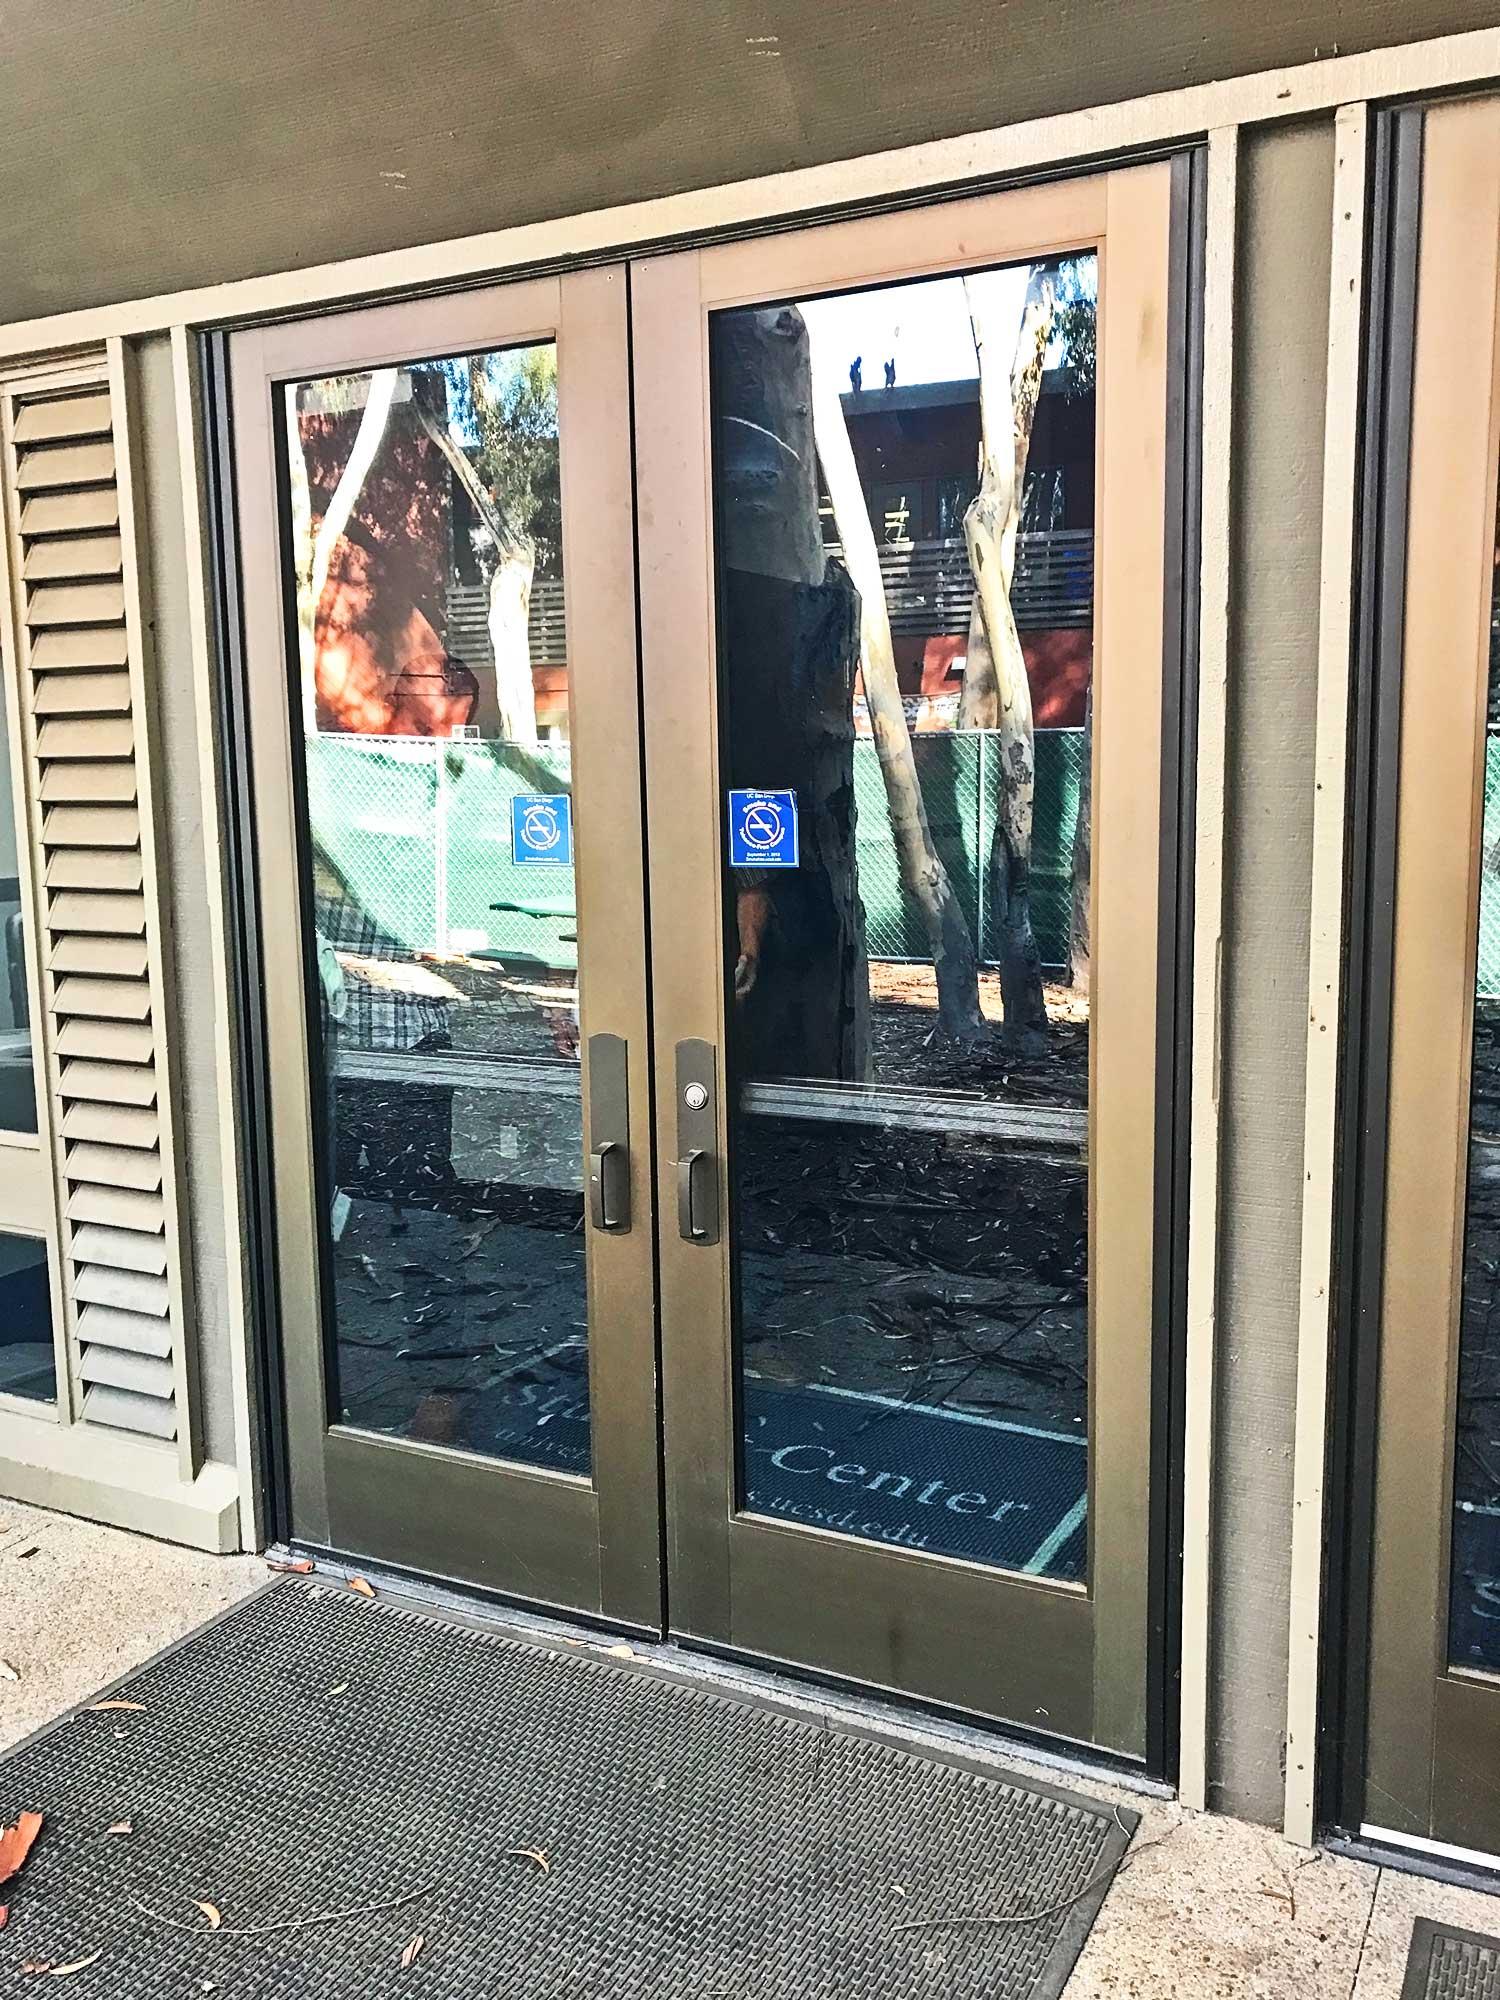 Exterior doors of food pantry